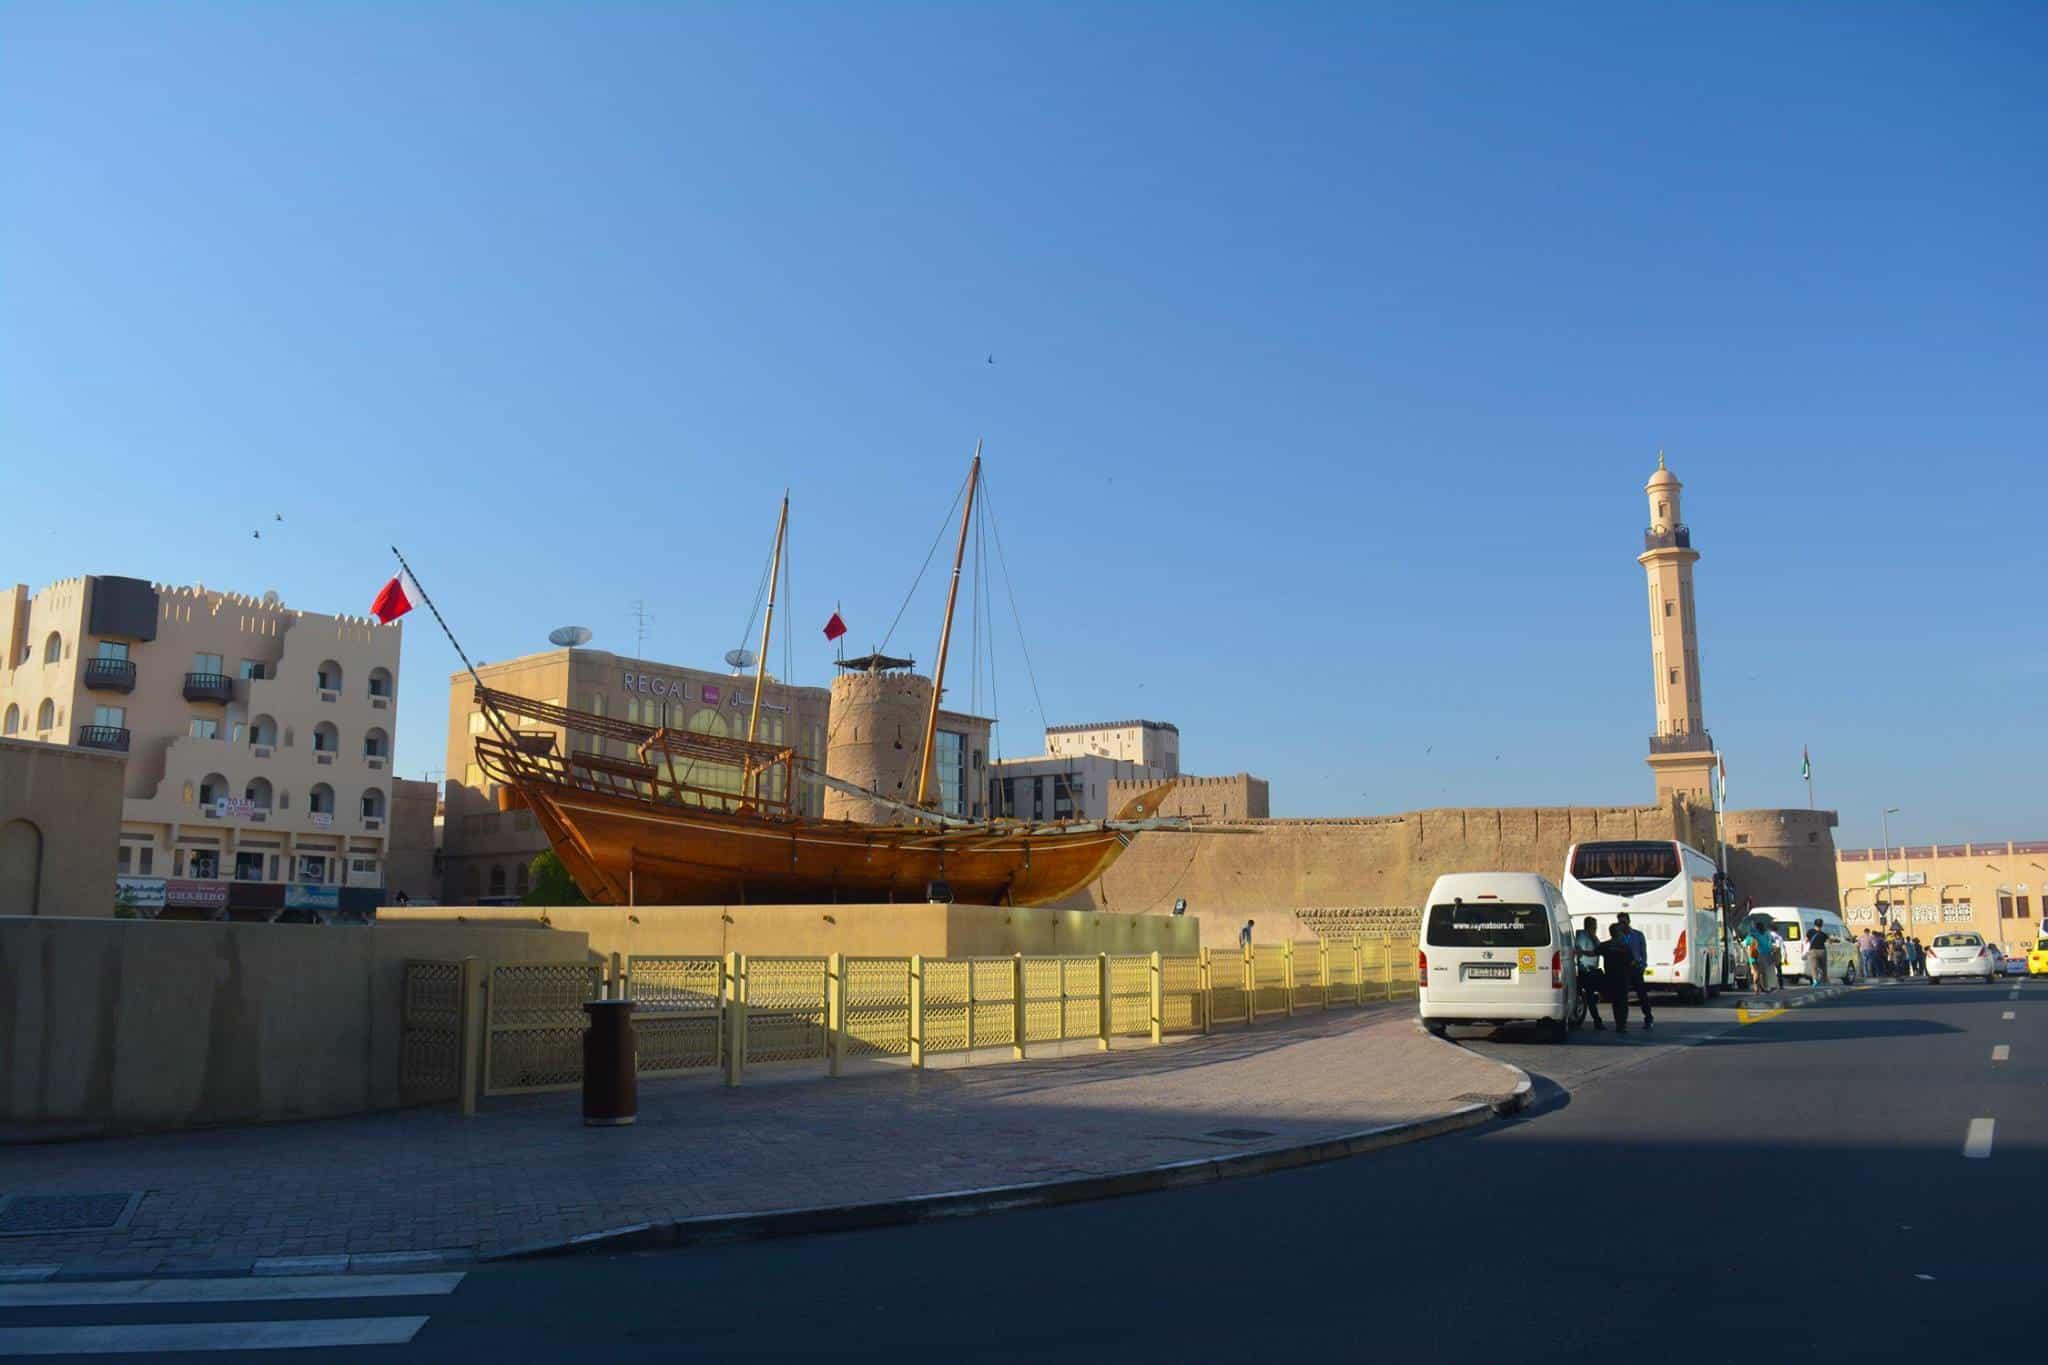 Dubai Museum 'Al Fahidi Fort' in Al Fahidi Historical Neighborhood